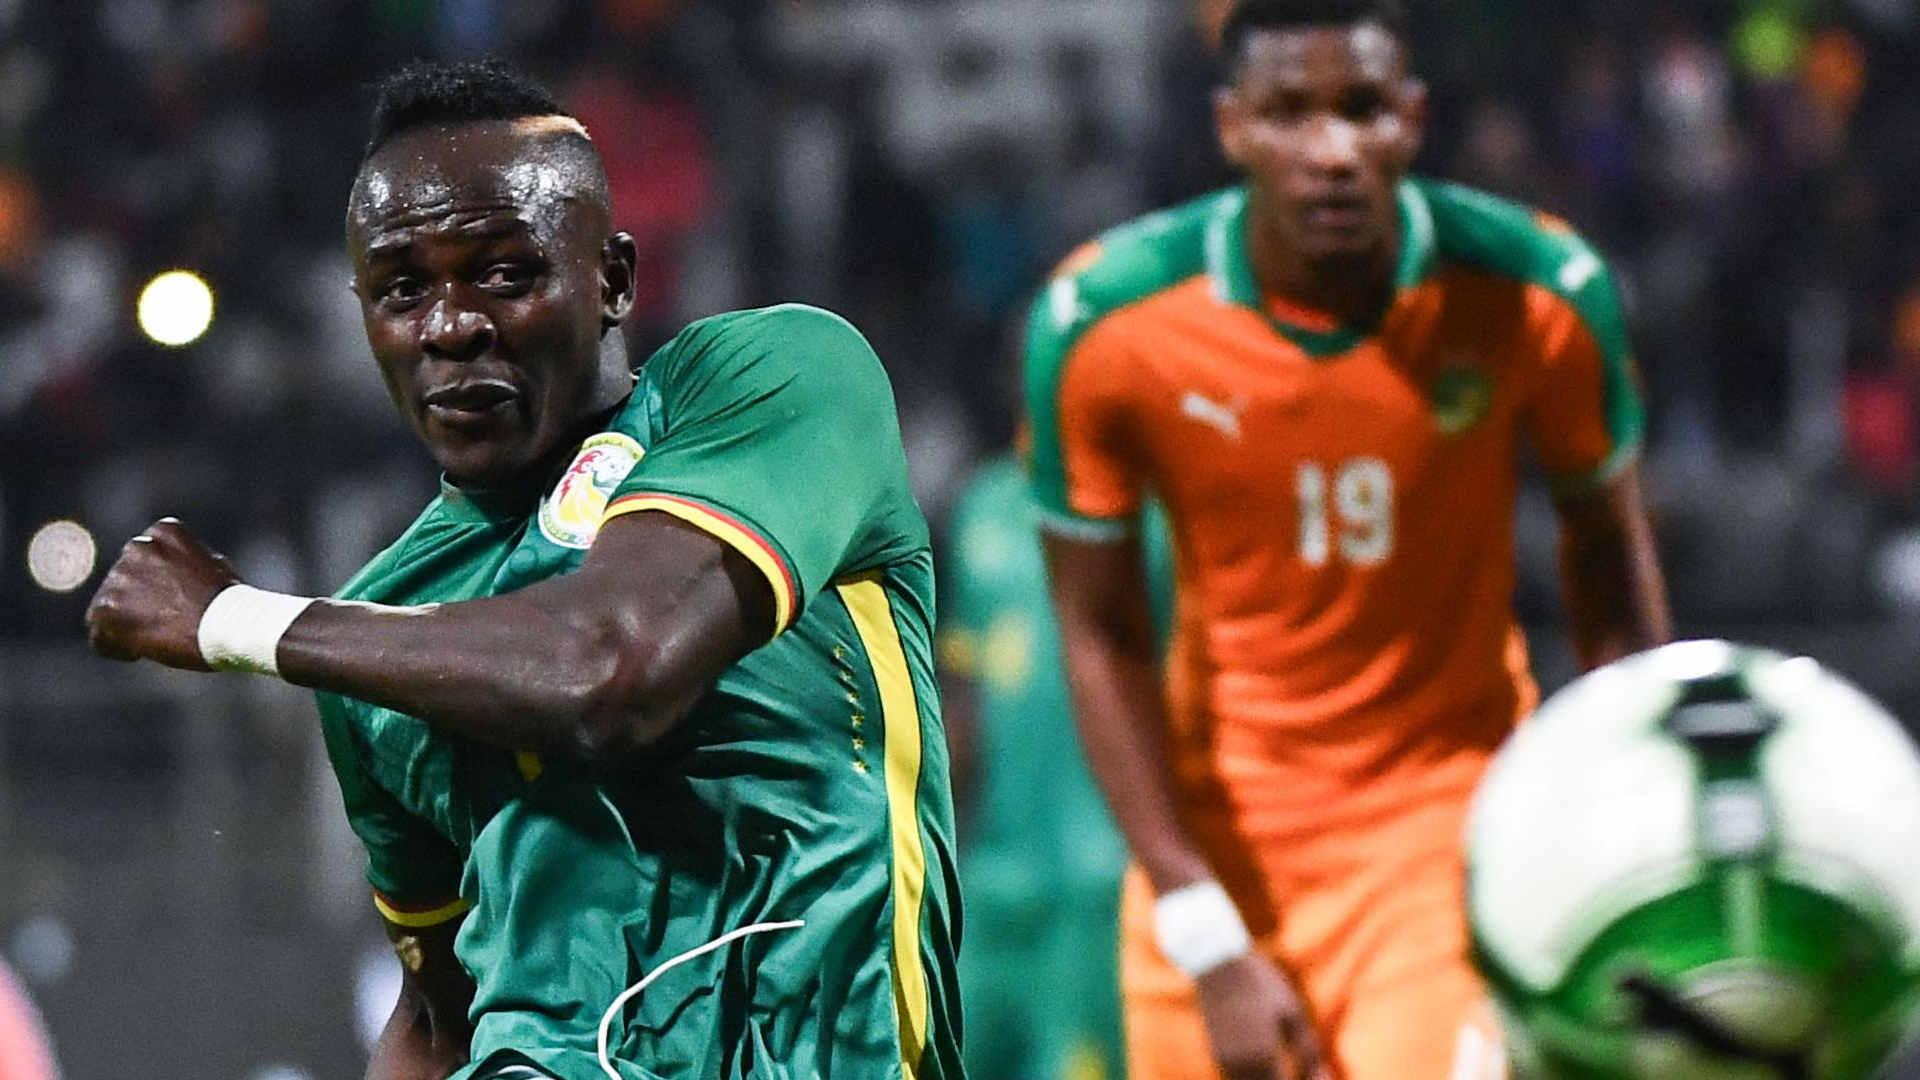 Avis 1xBet Senegal